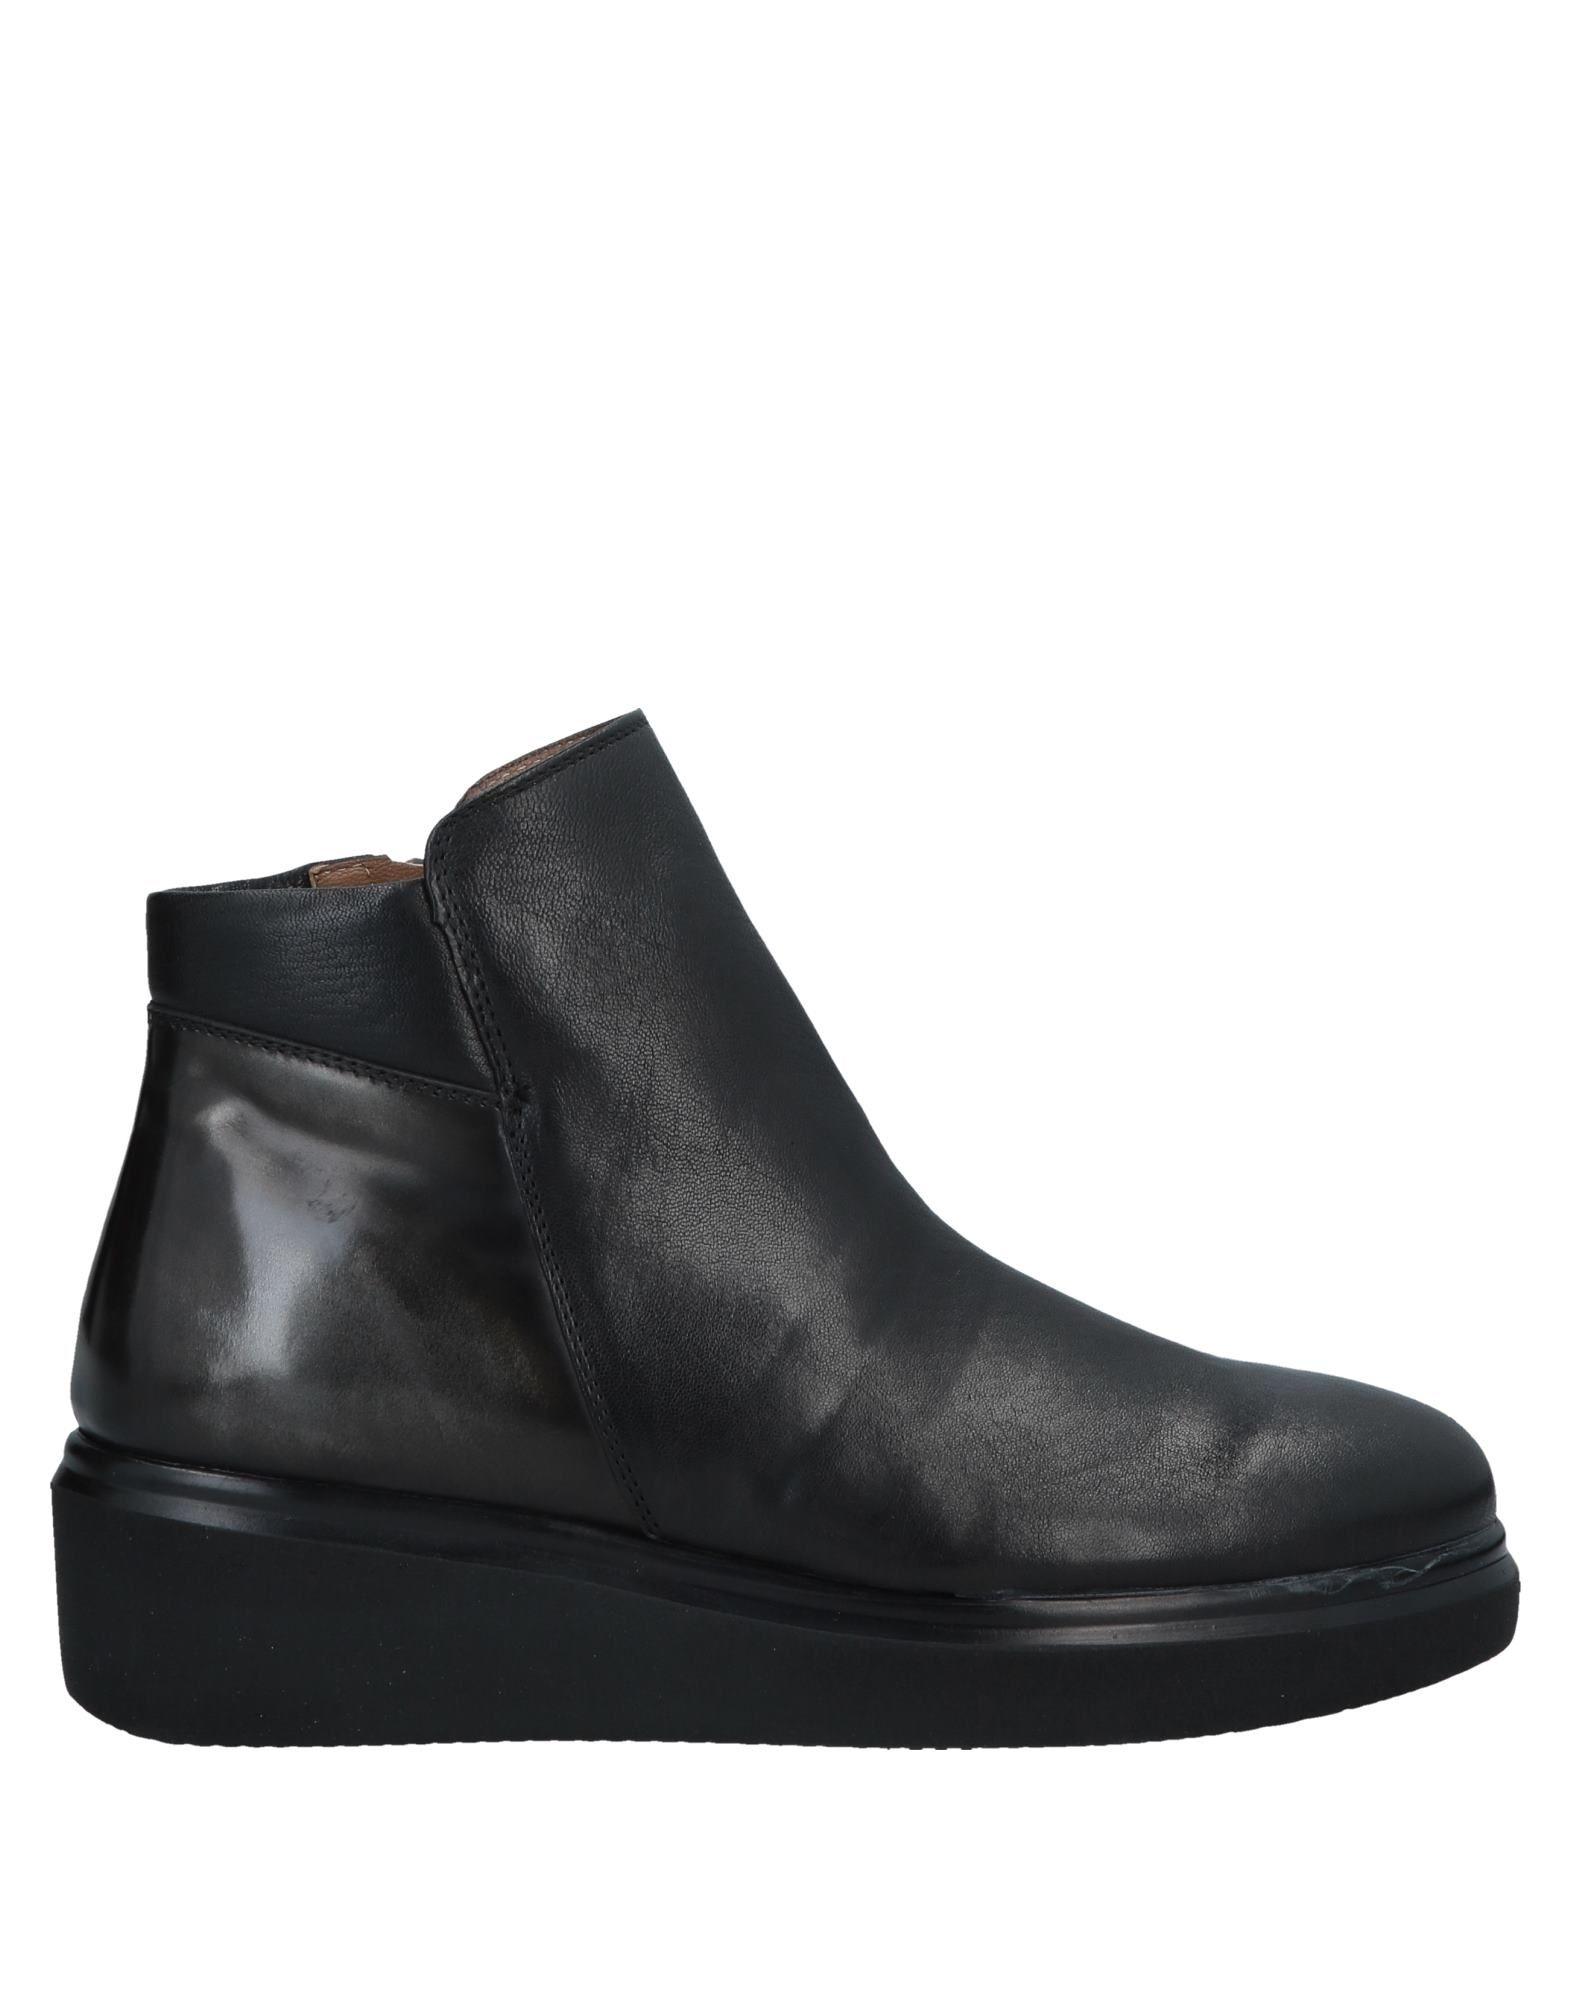 JUST MELLUSO Полусапоги и высокие ботинки melluso полусапоги и высокие ботинки